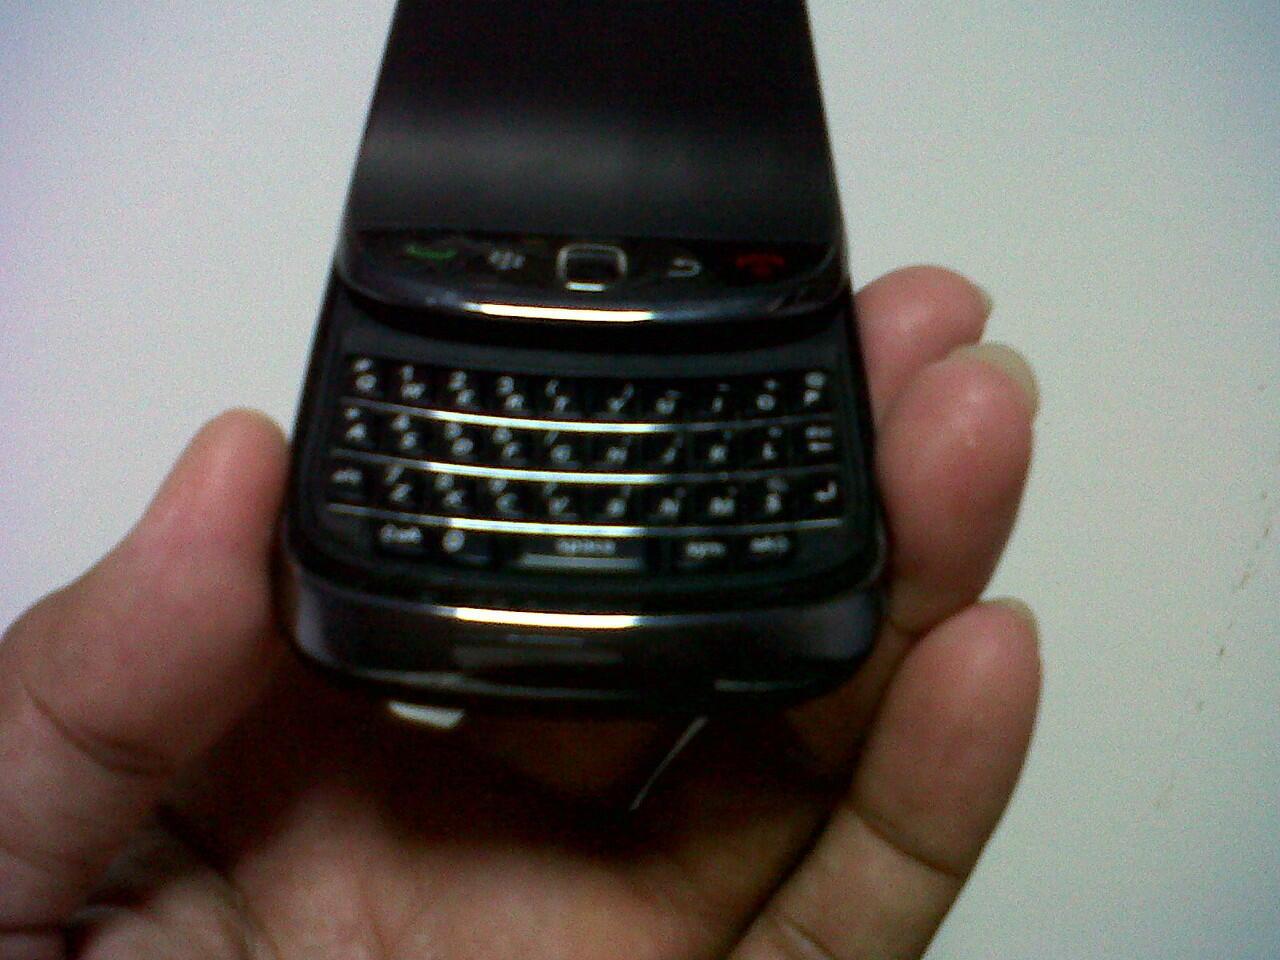 Blackberry Torch 9800 murmer semarang